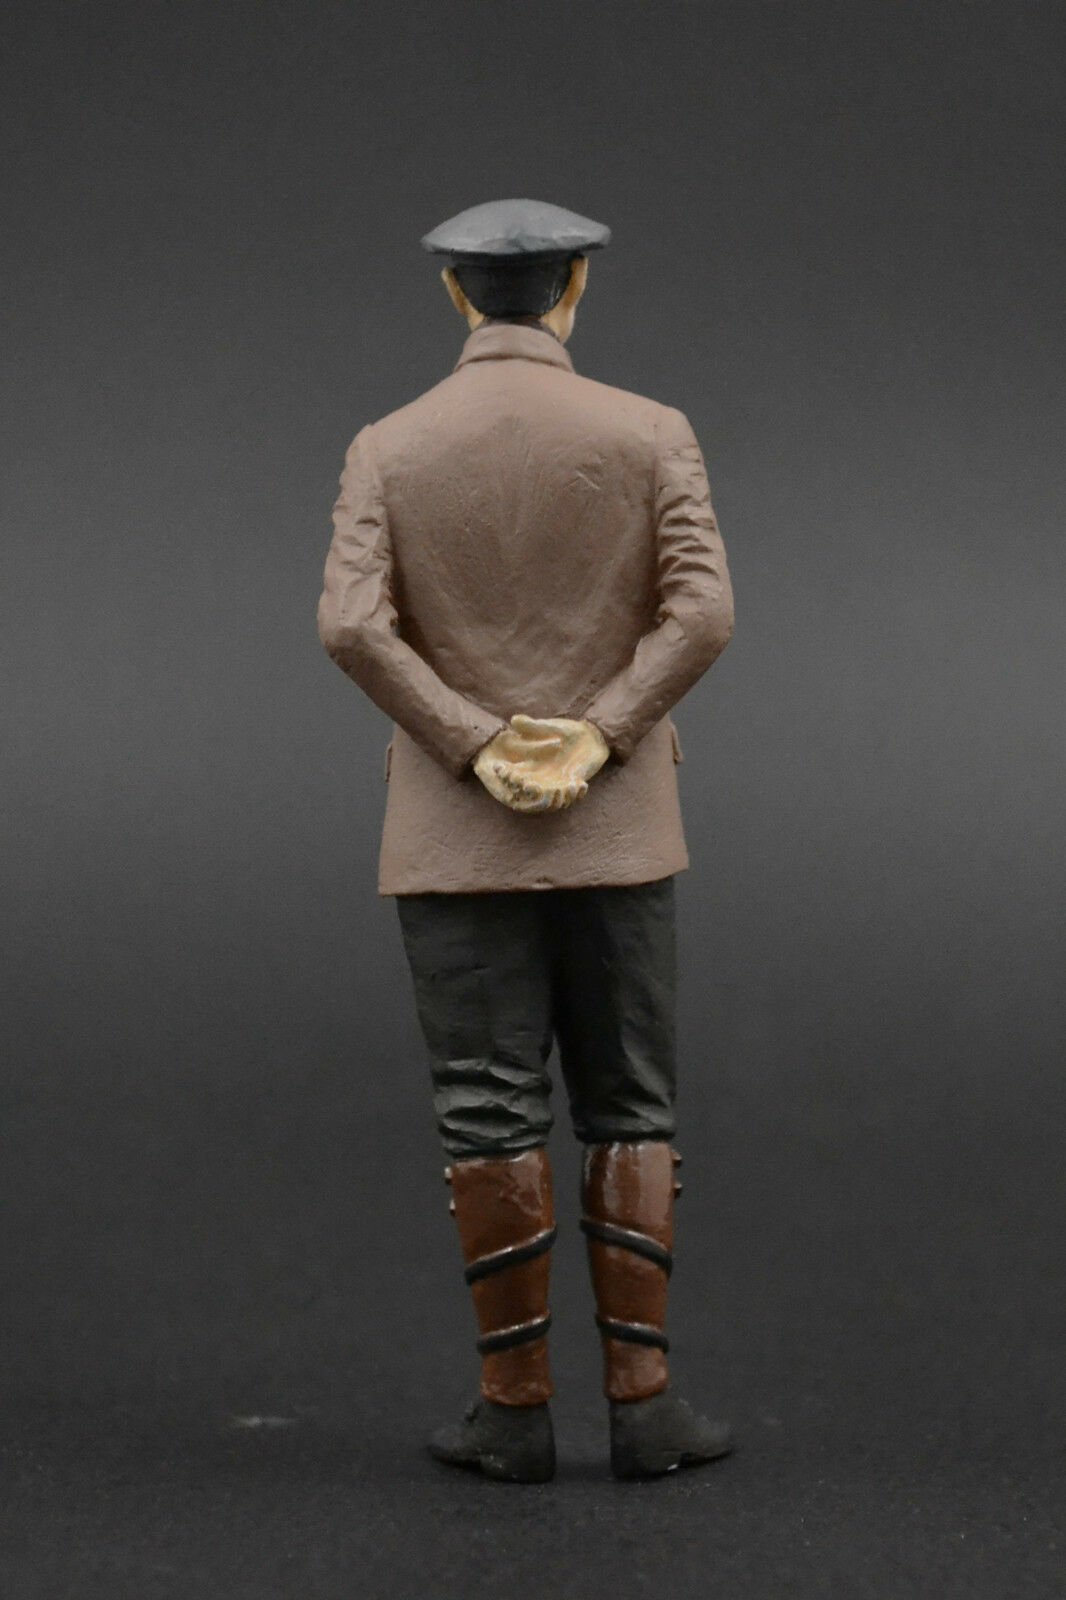 Charles Rolls Figura Figura Figura per 1 18 Rolls-Royce Kyosho e4f61a